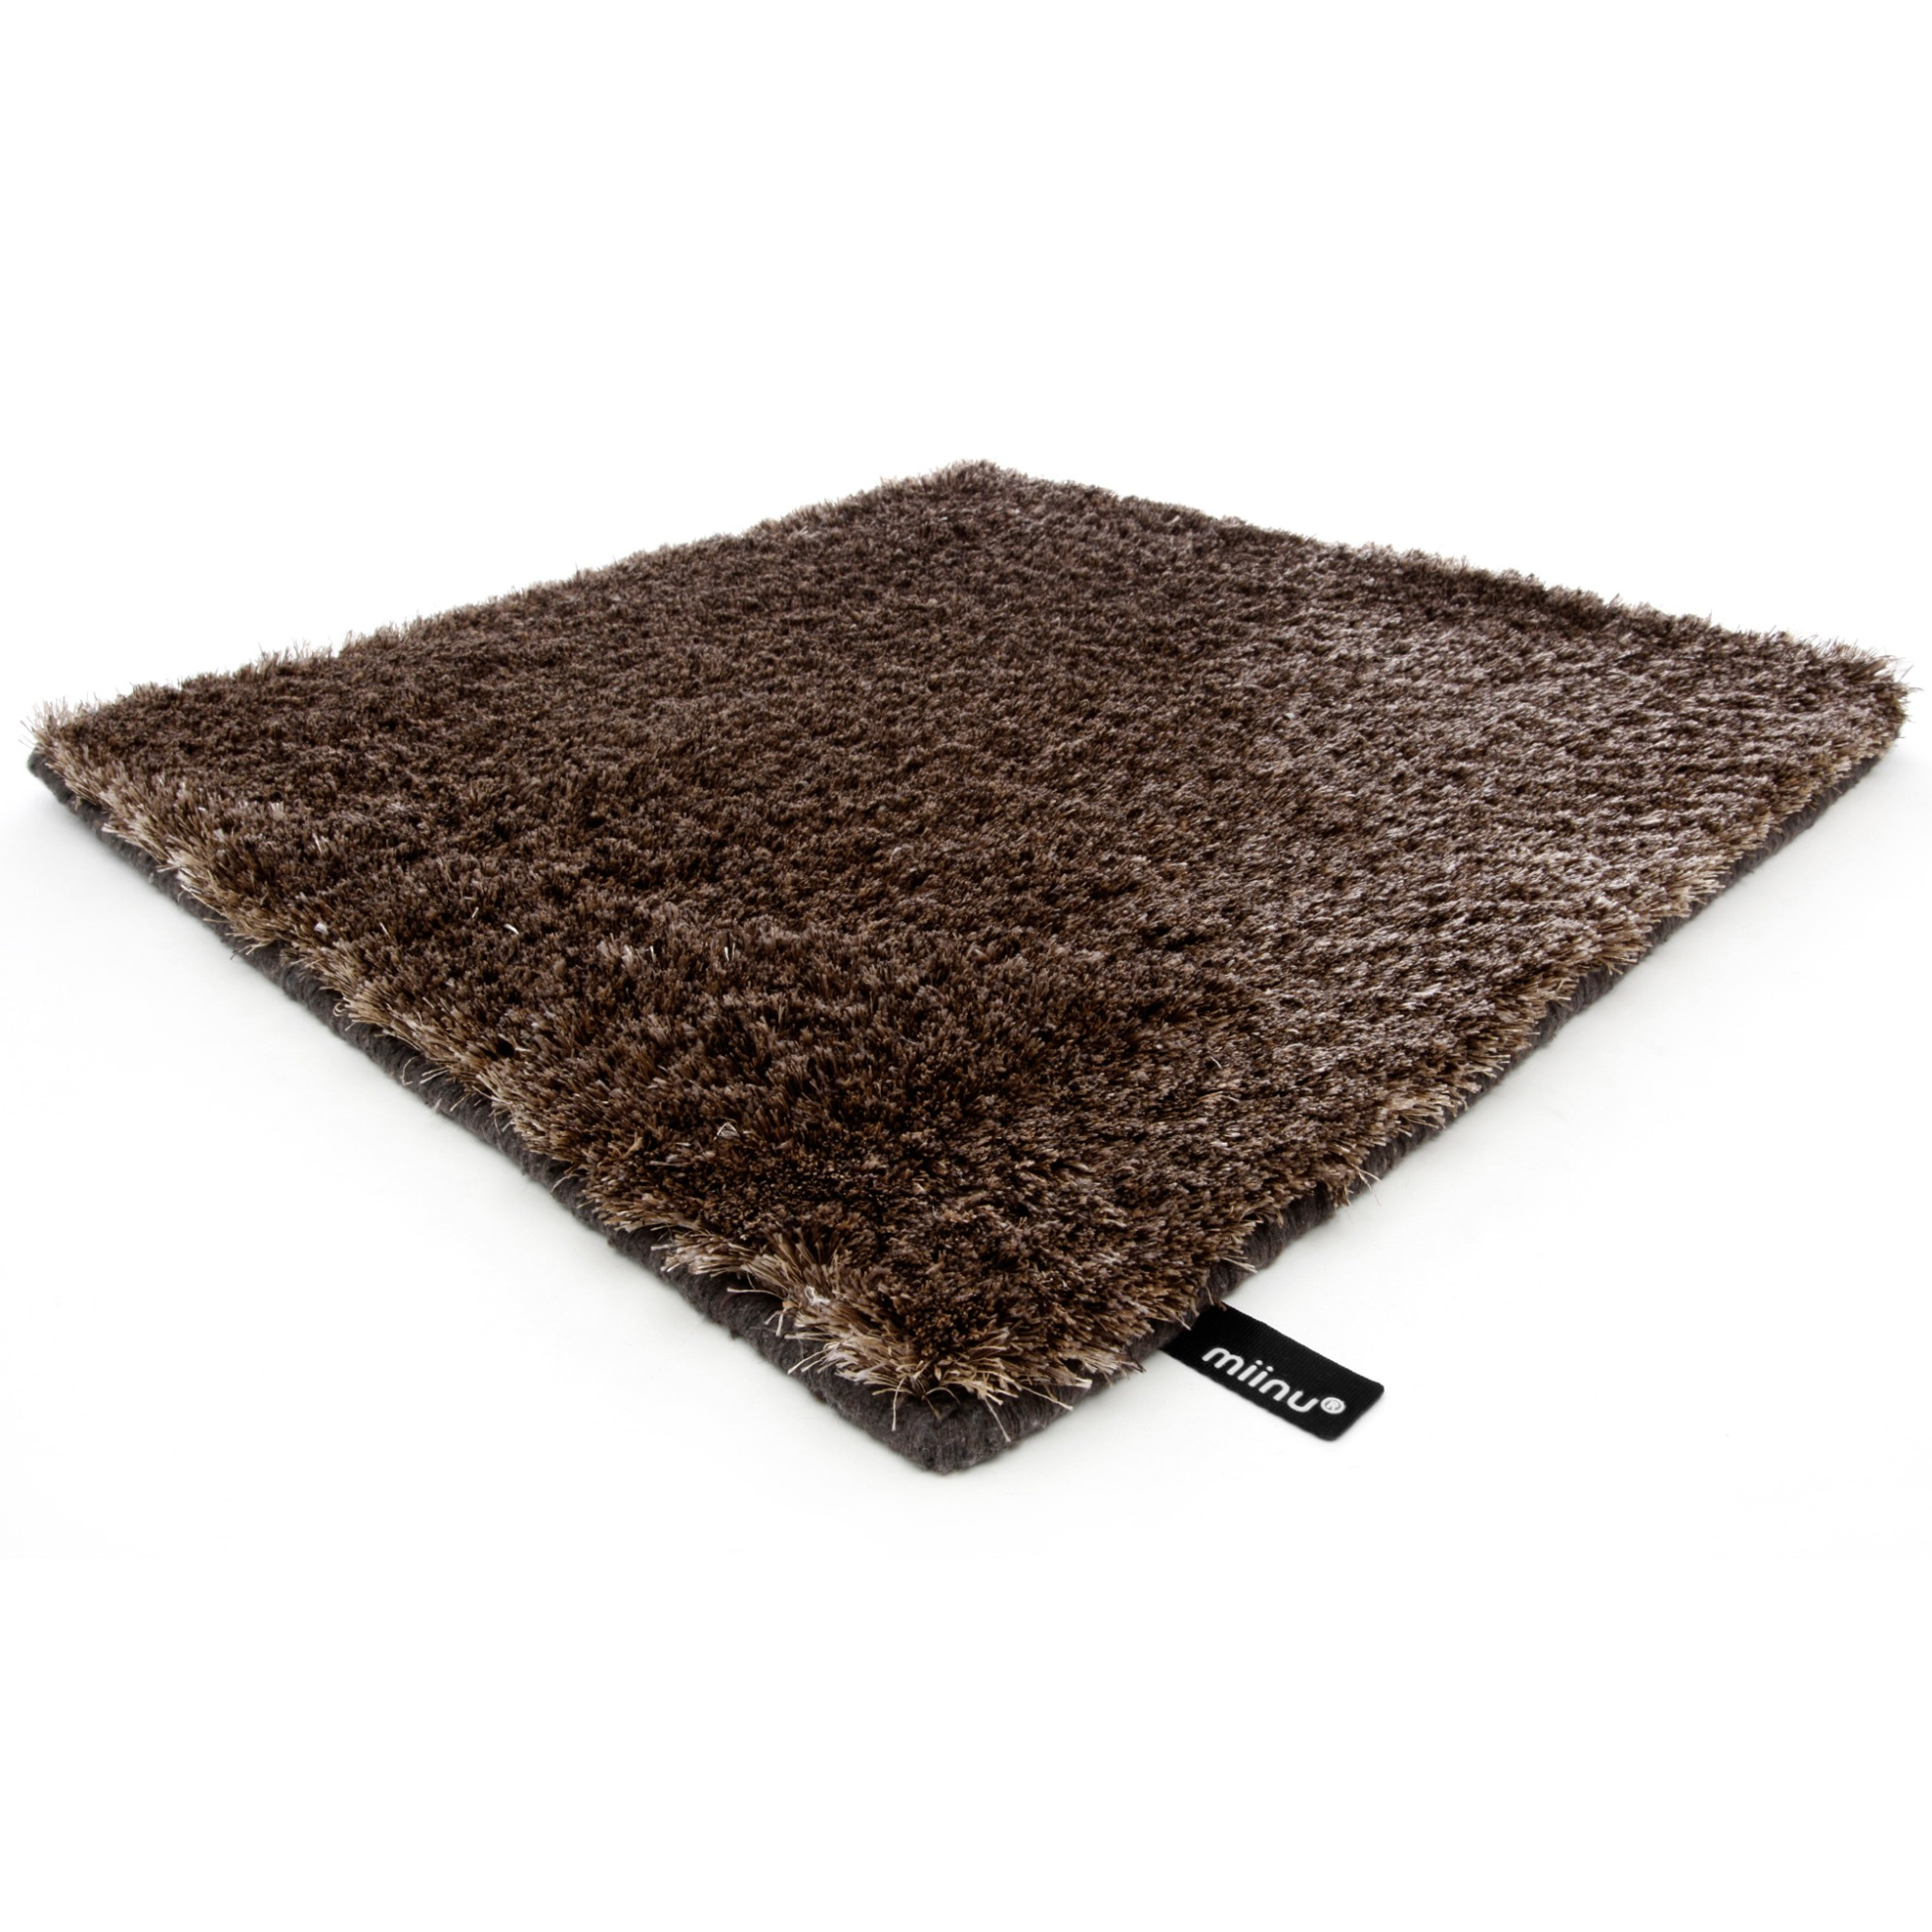 homelike squared rug by miinu. Black Bedroom Furniture Sets. Home Design Ideas